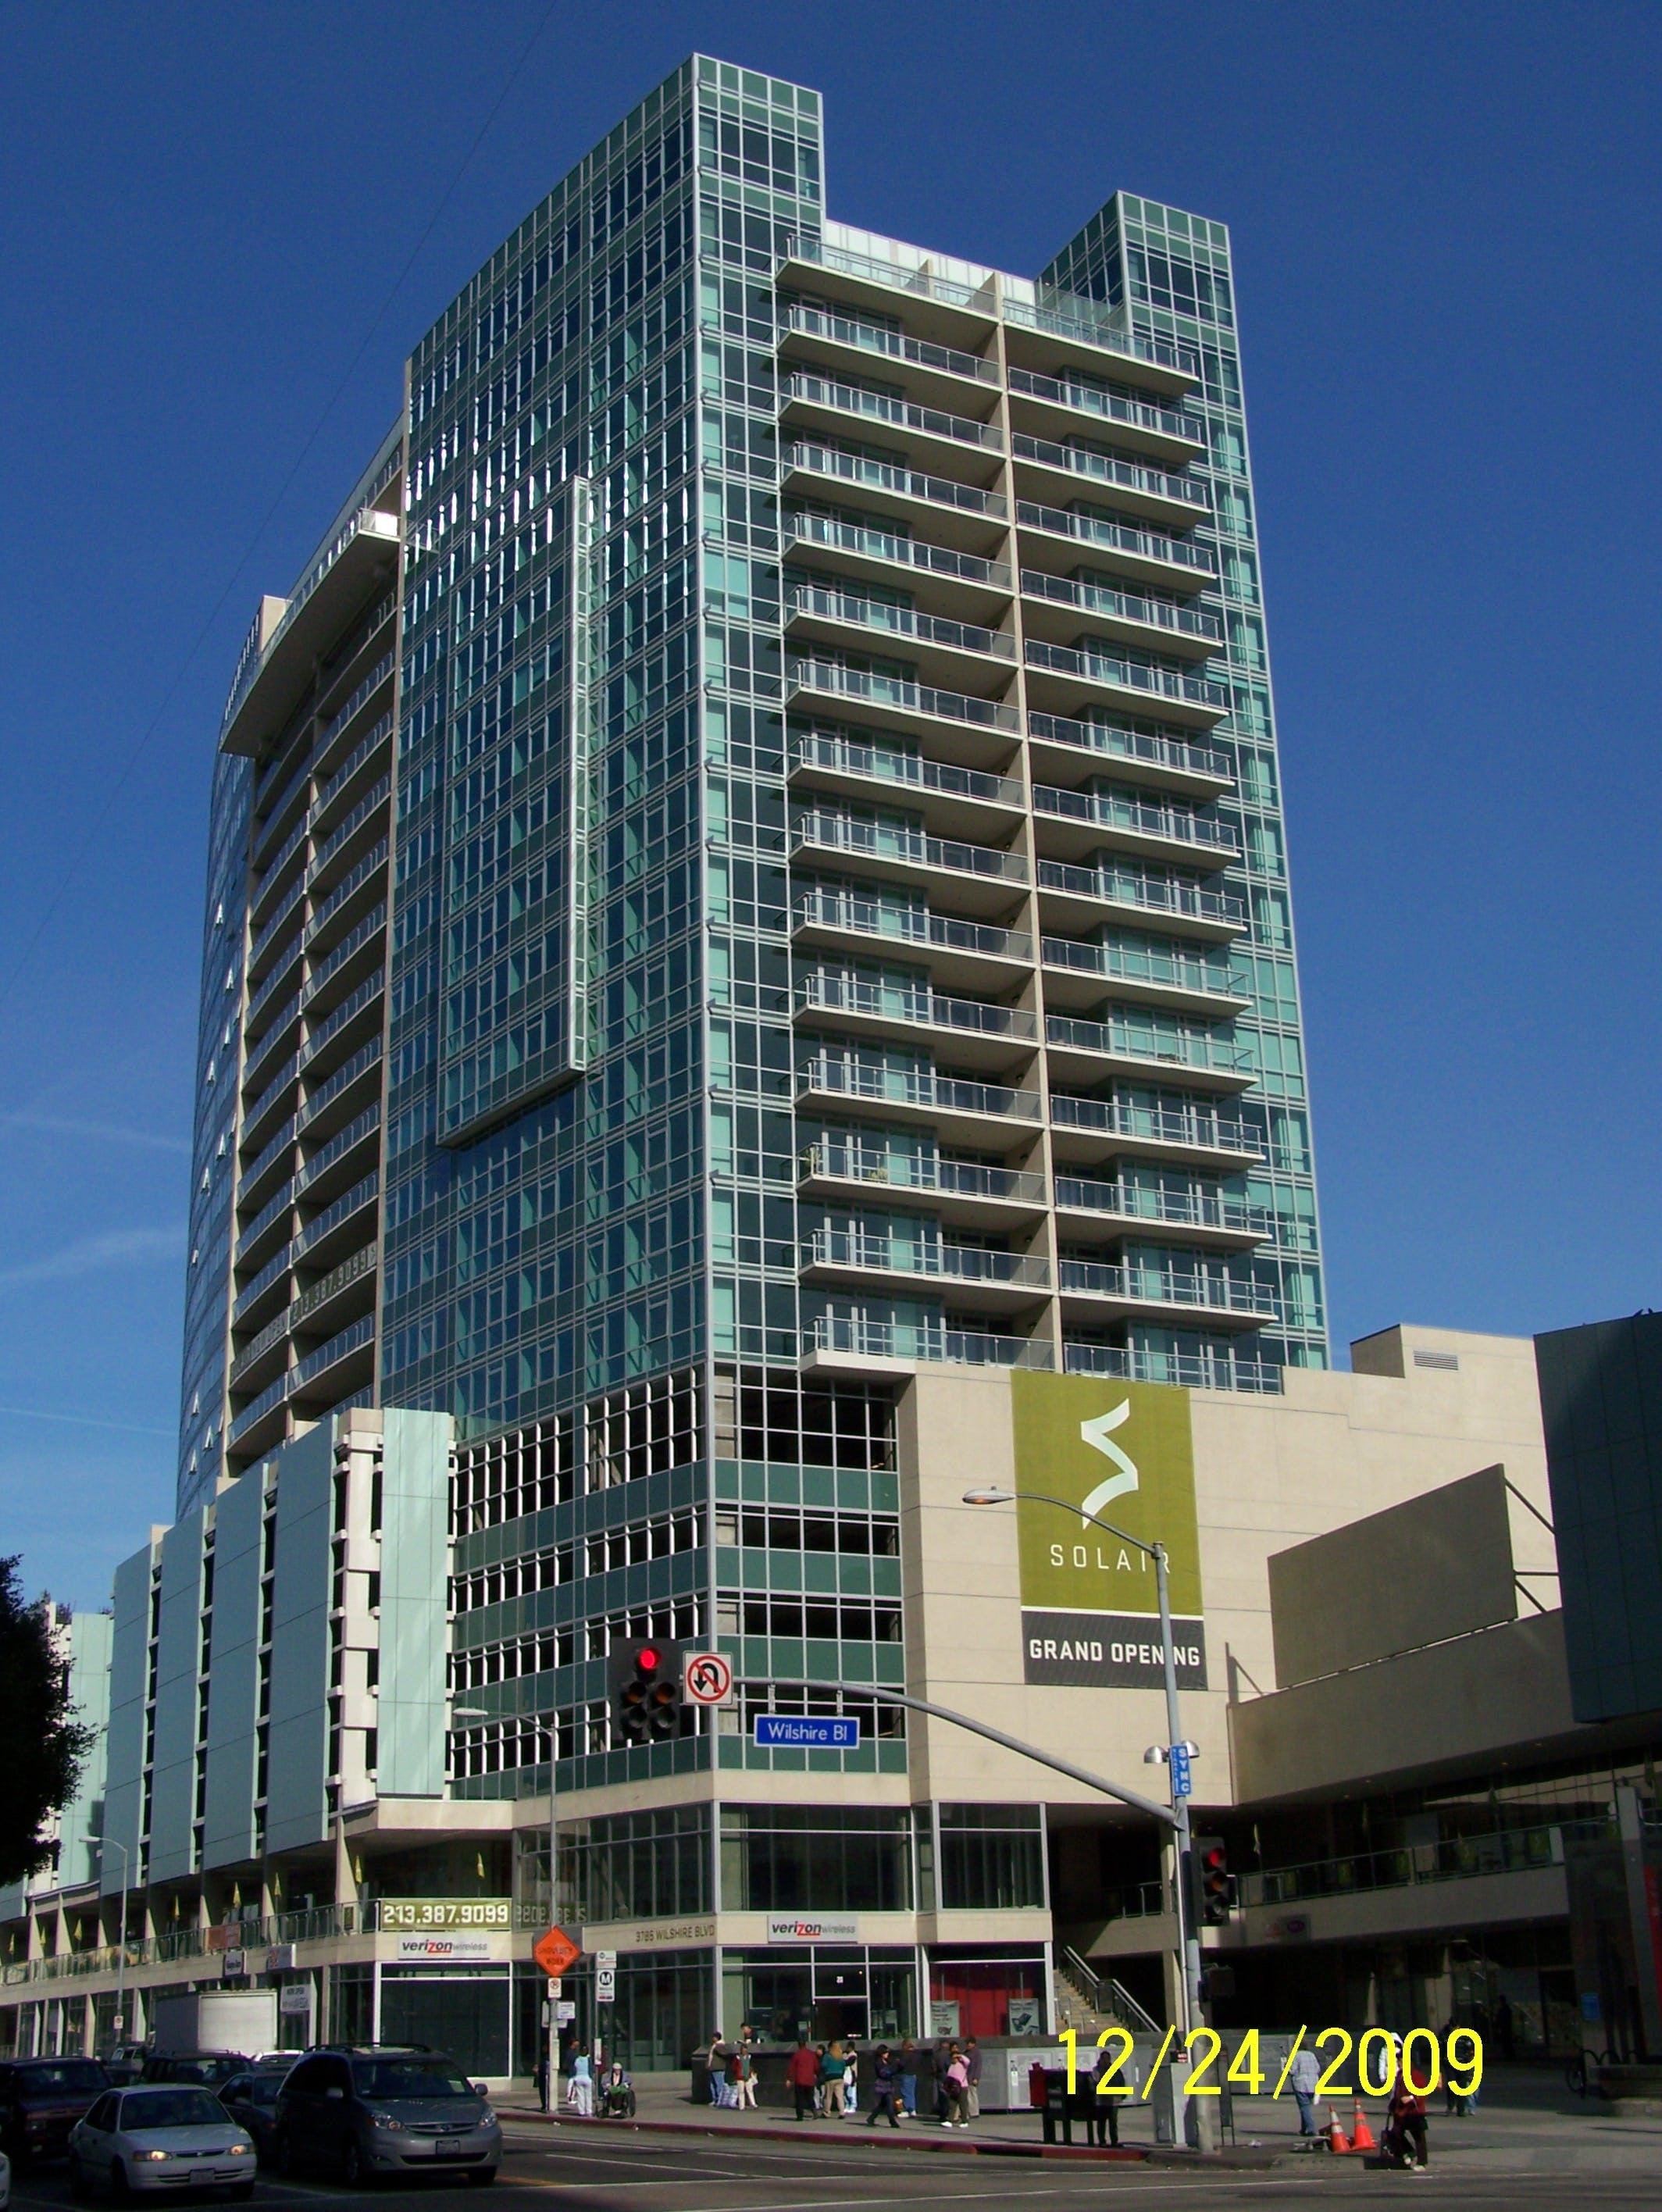 Mixed Use Condominium Solair Jeffrey Weinstein Archinect